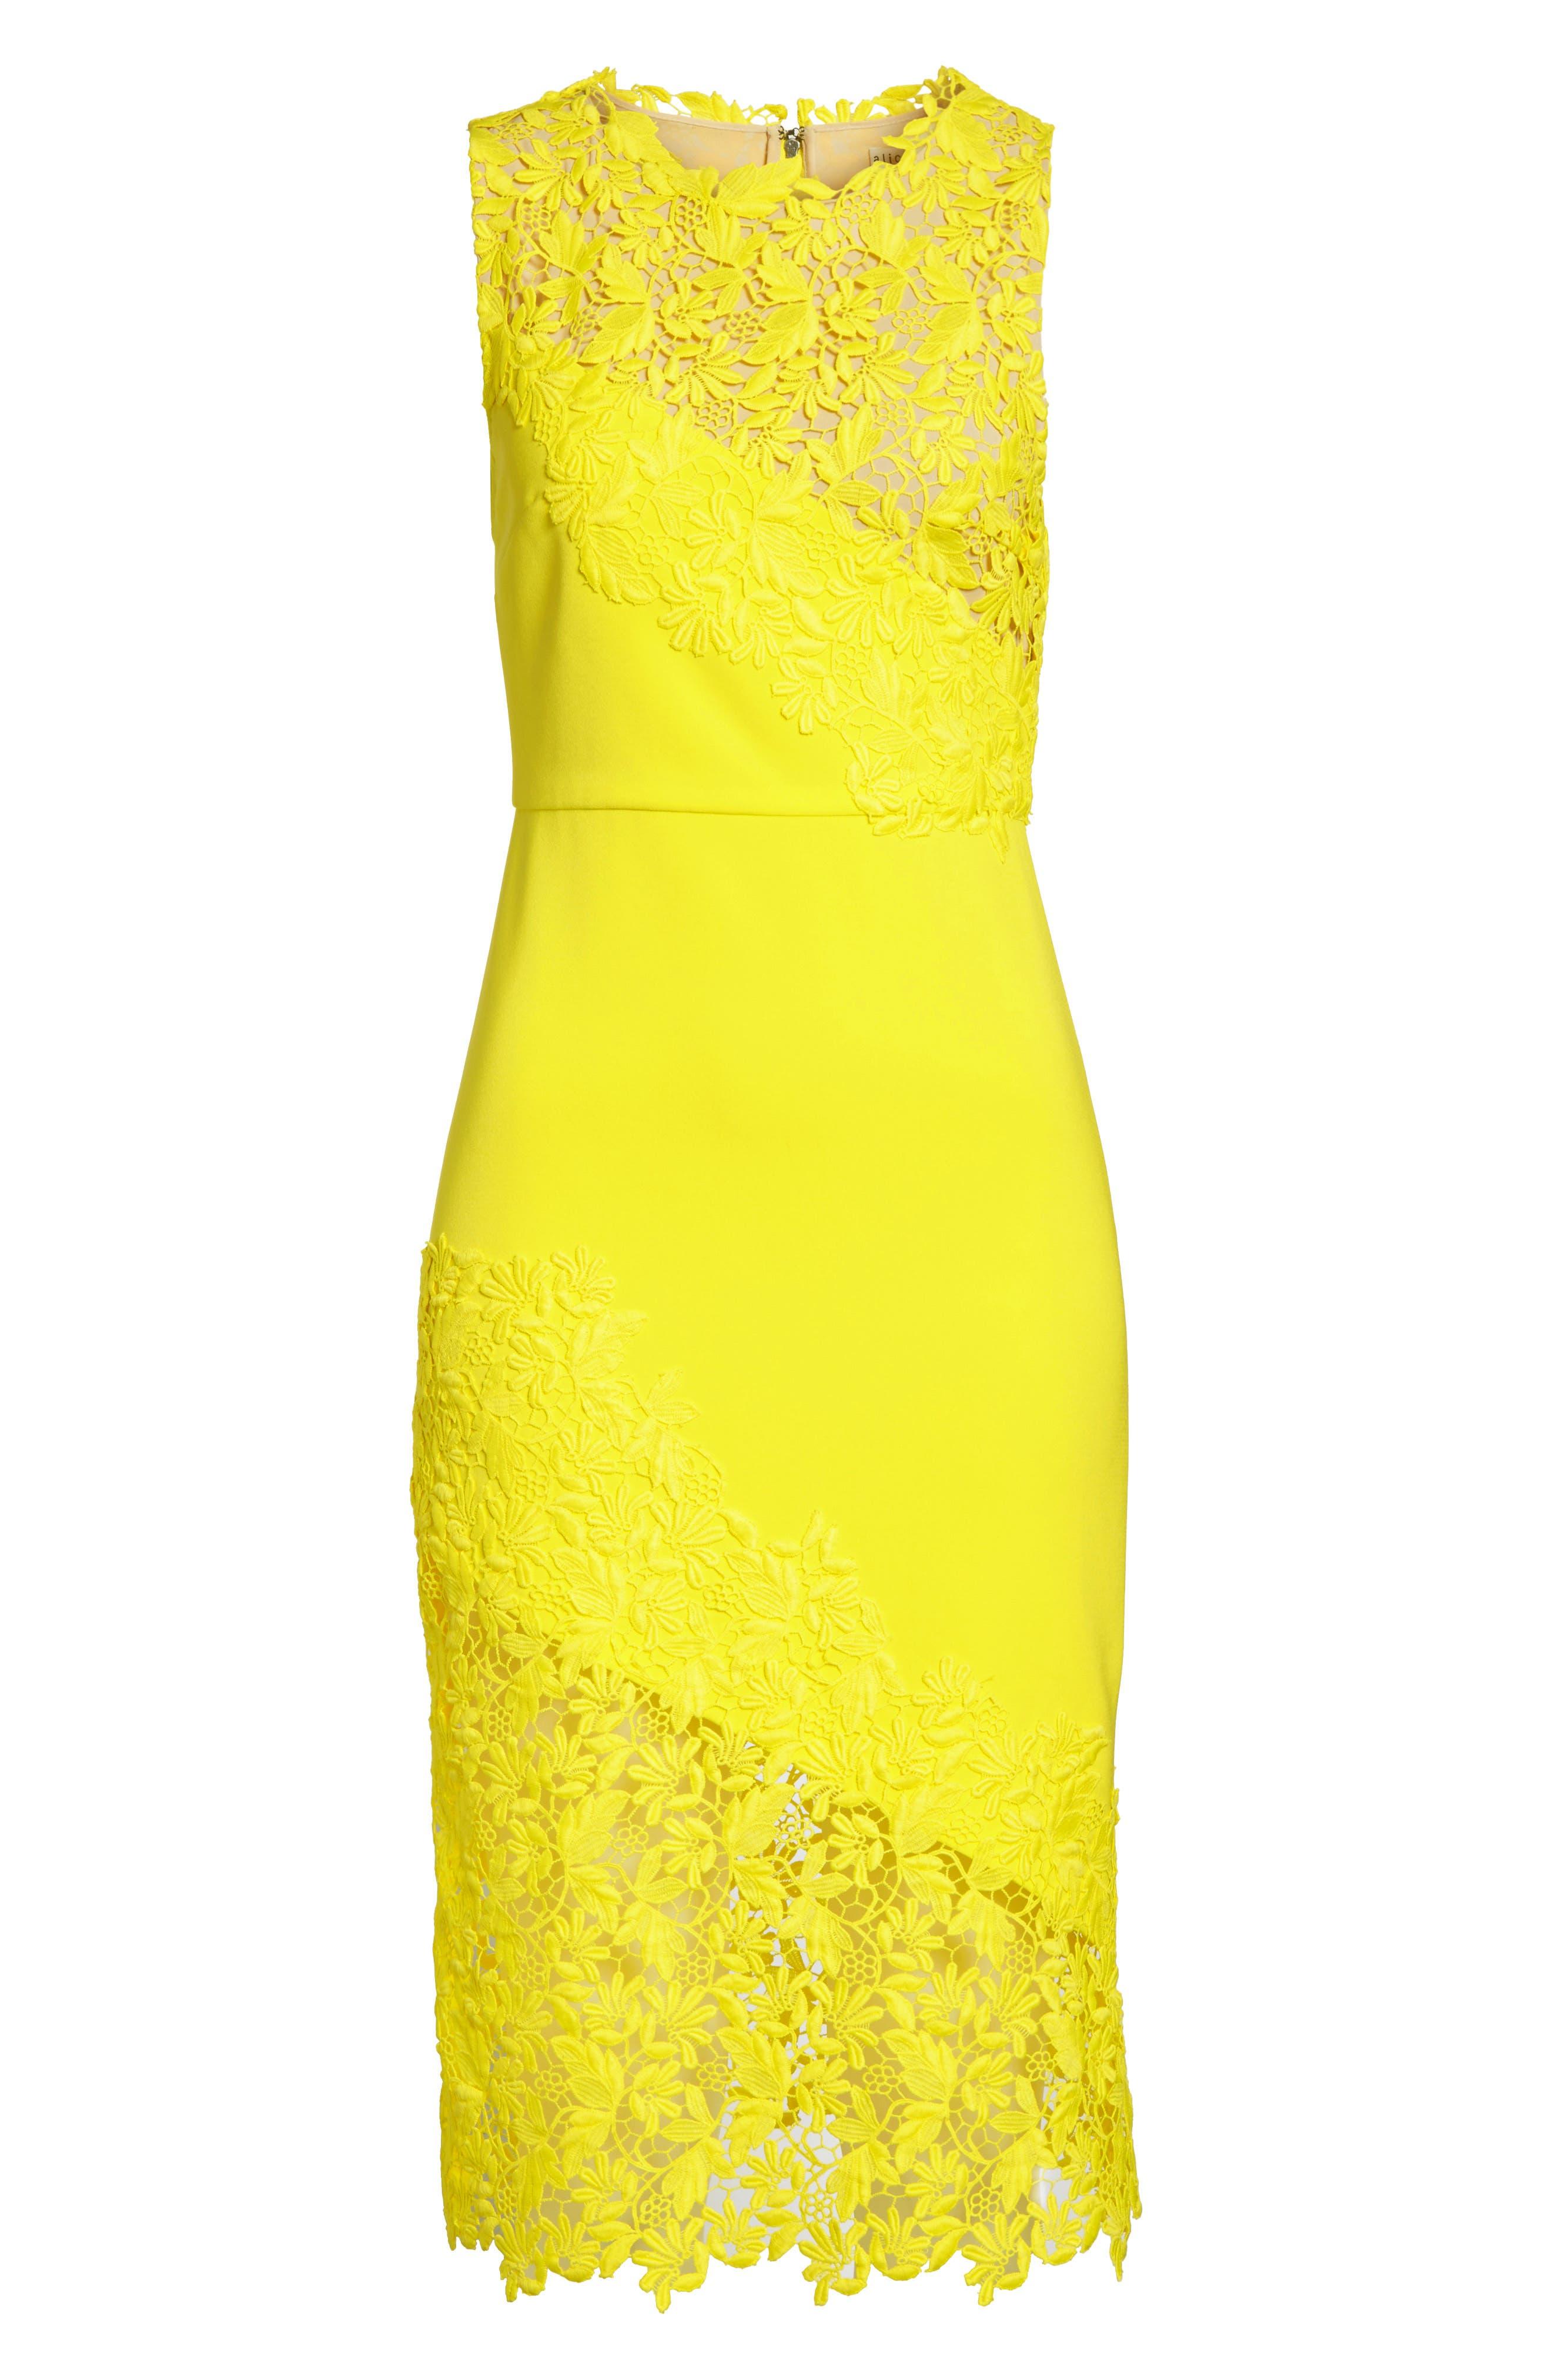 Margy Lace Overlay Body-Con Dress,                             Alternate thumbnail 6, color,                             Lemon